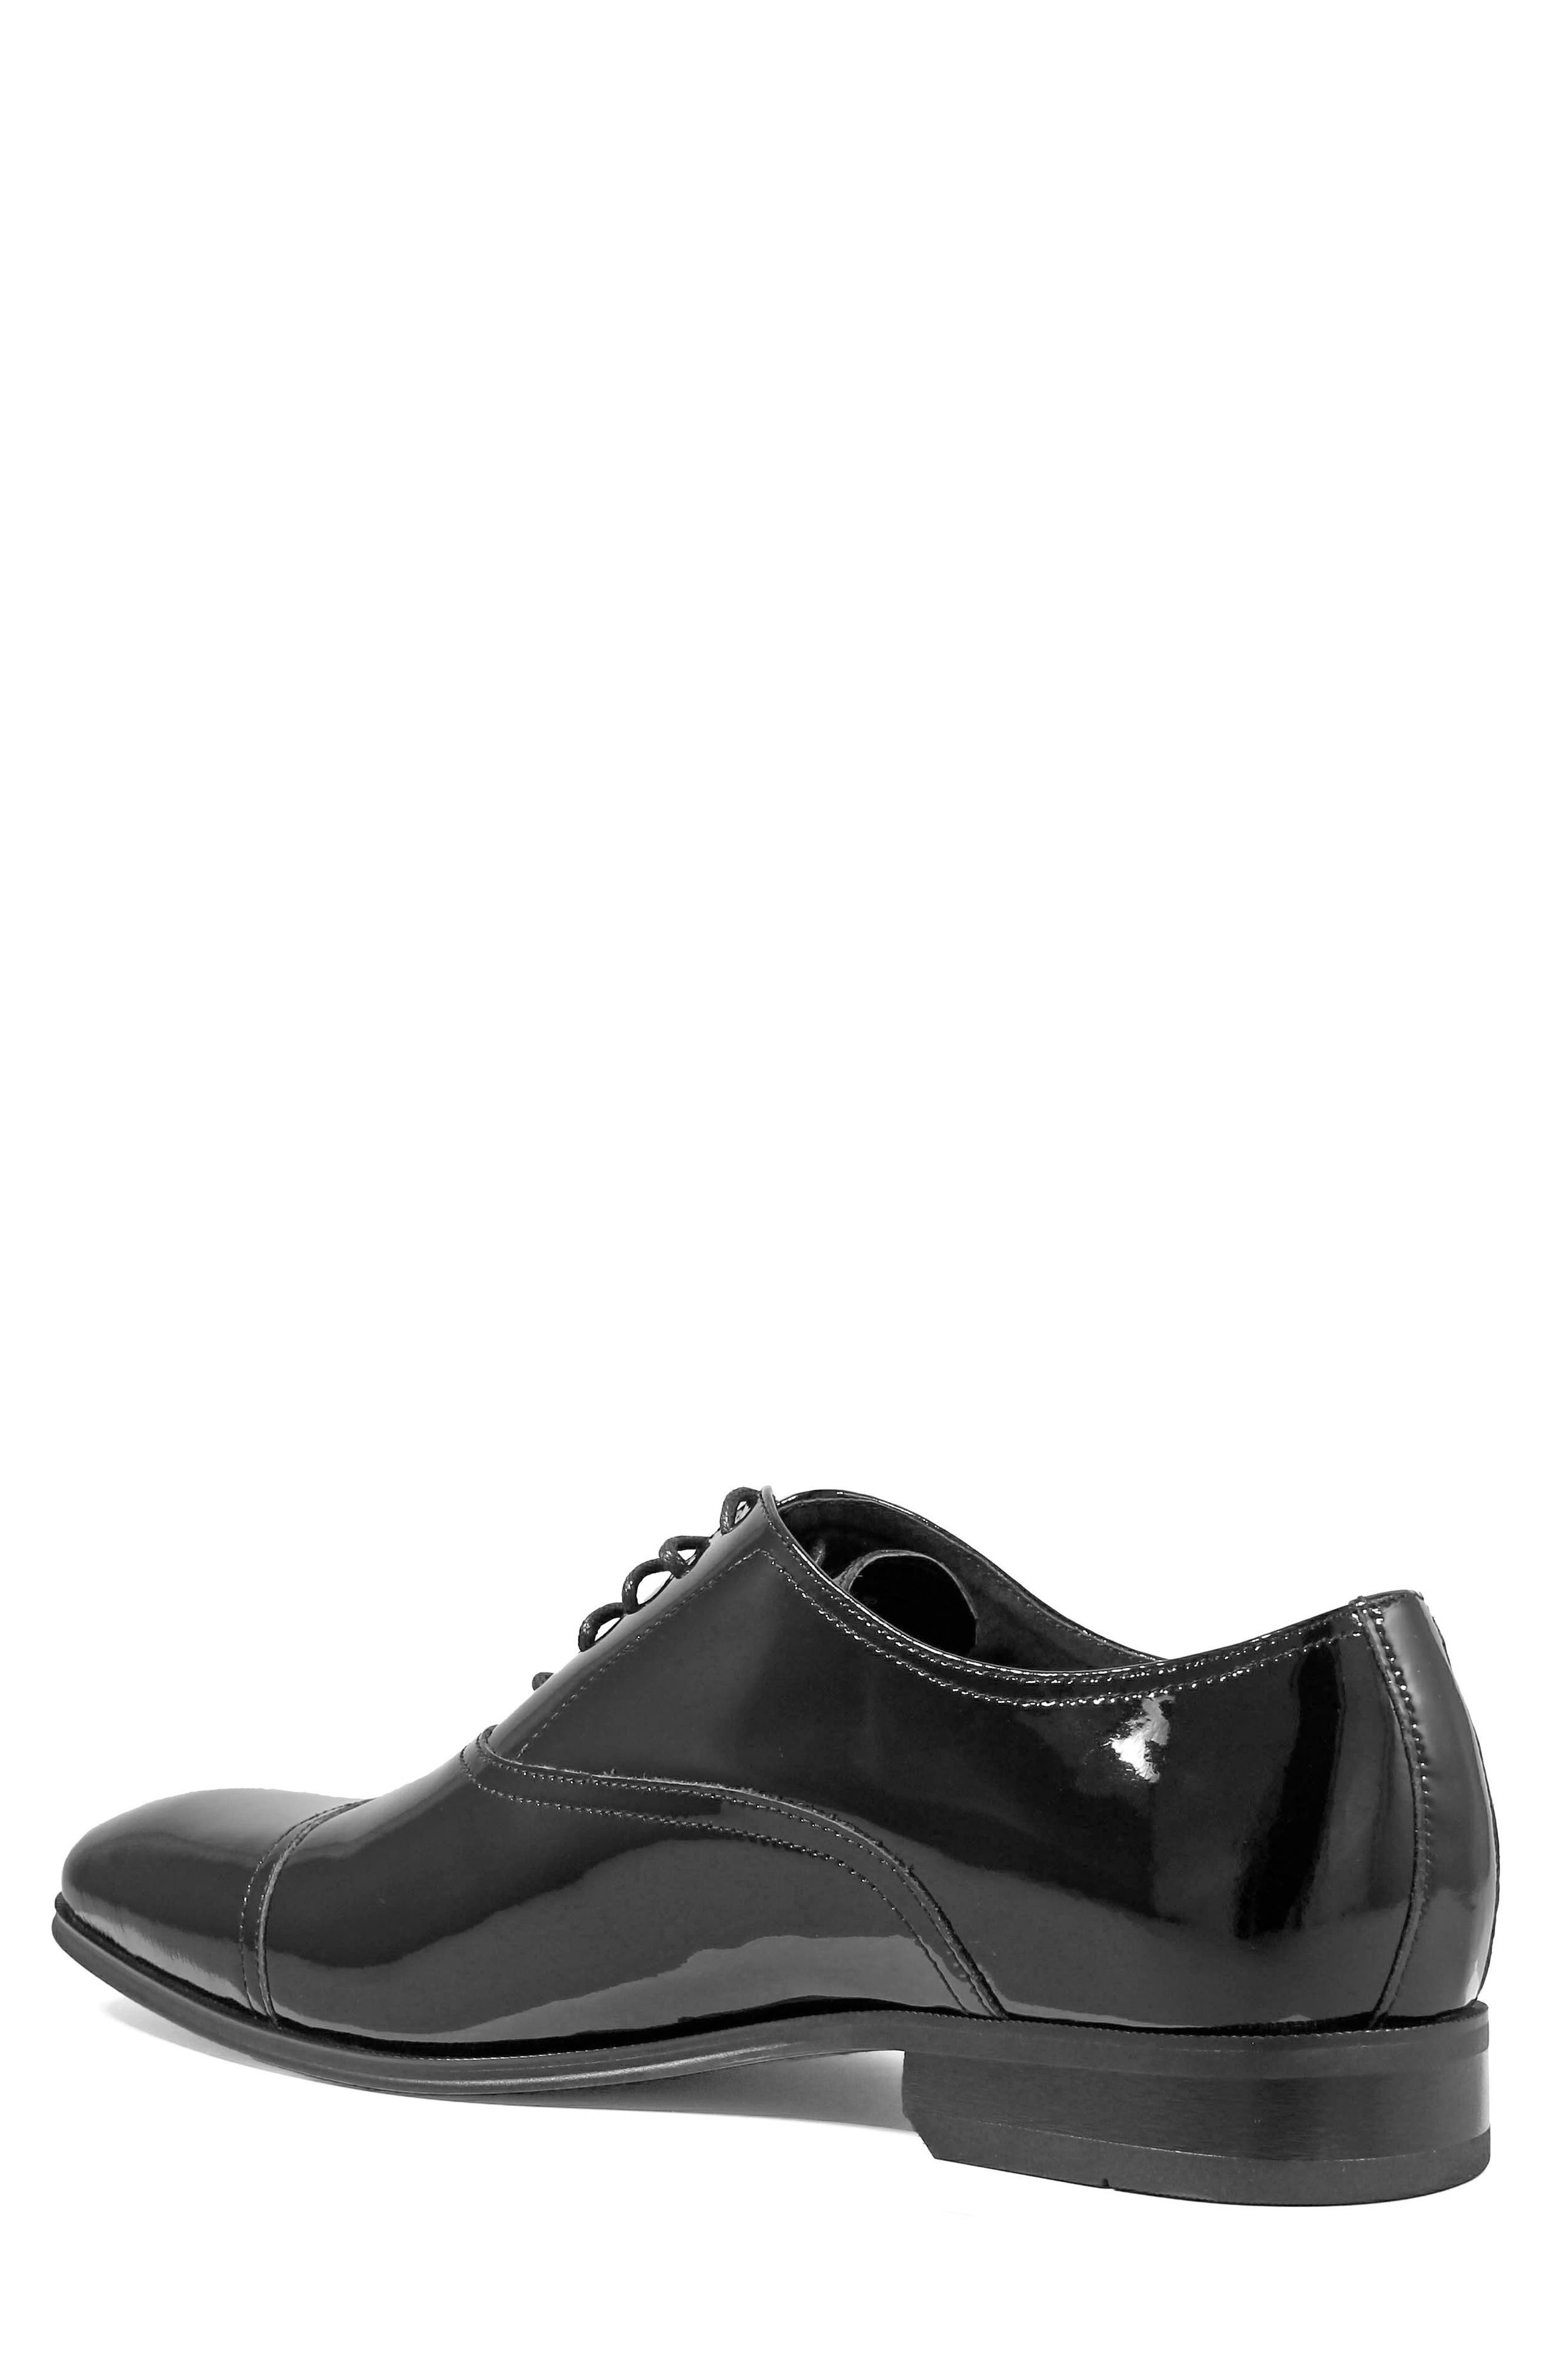 Tux Cap Toe Oxford,                             Alternate thumbnail 2, color,                             BLACK PATENT LEATHER